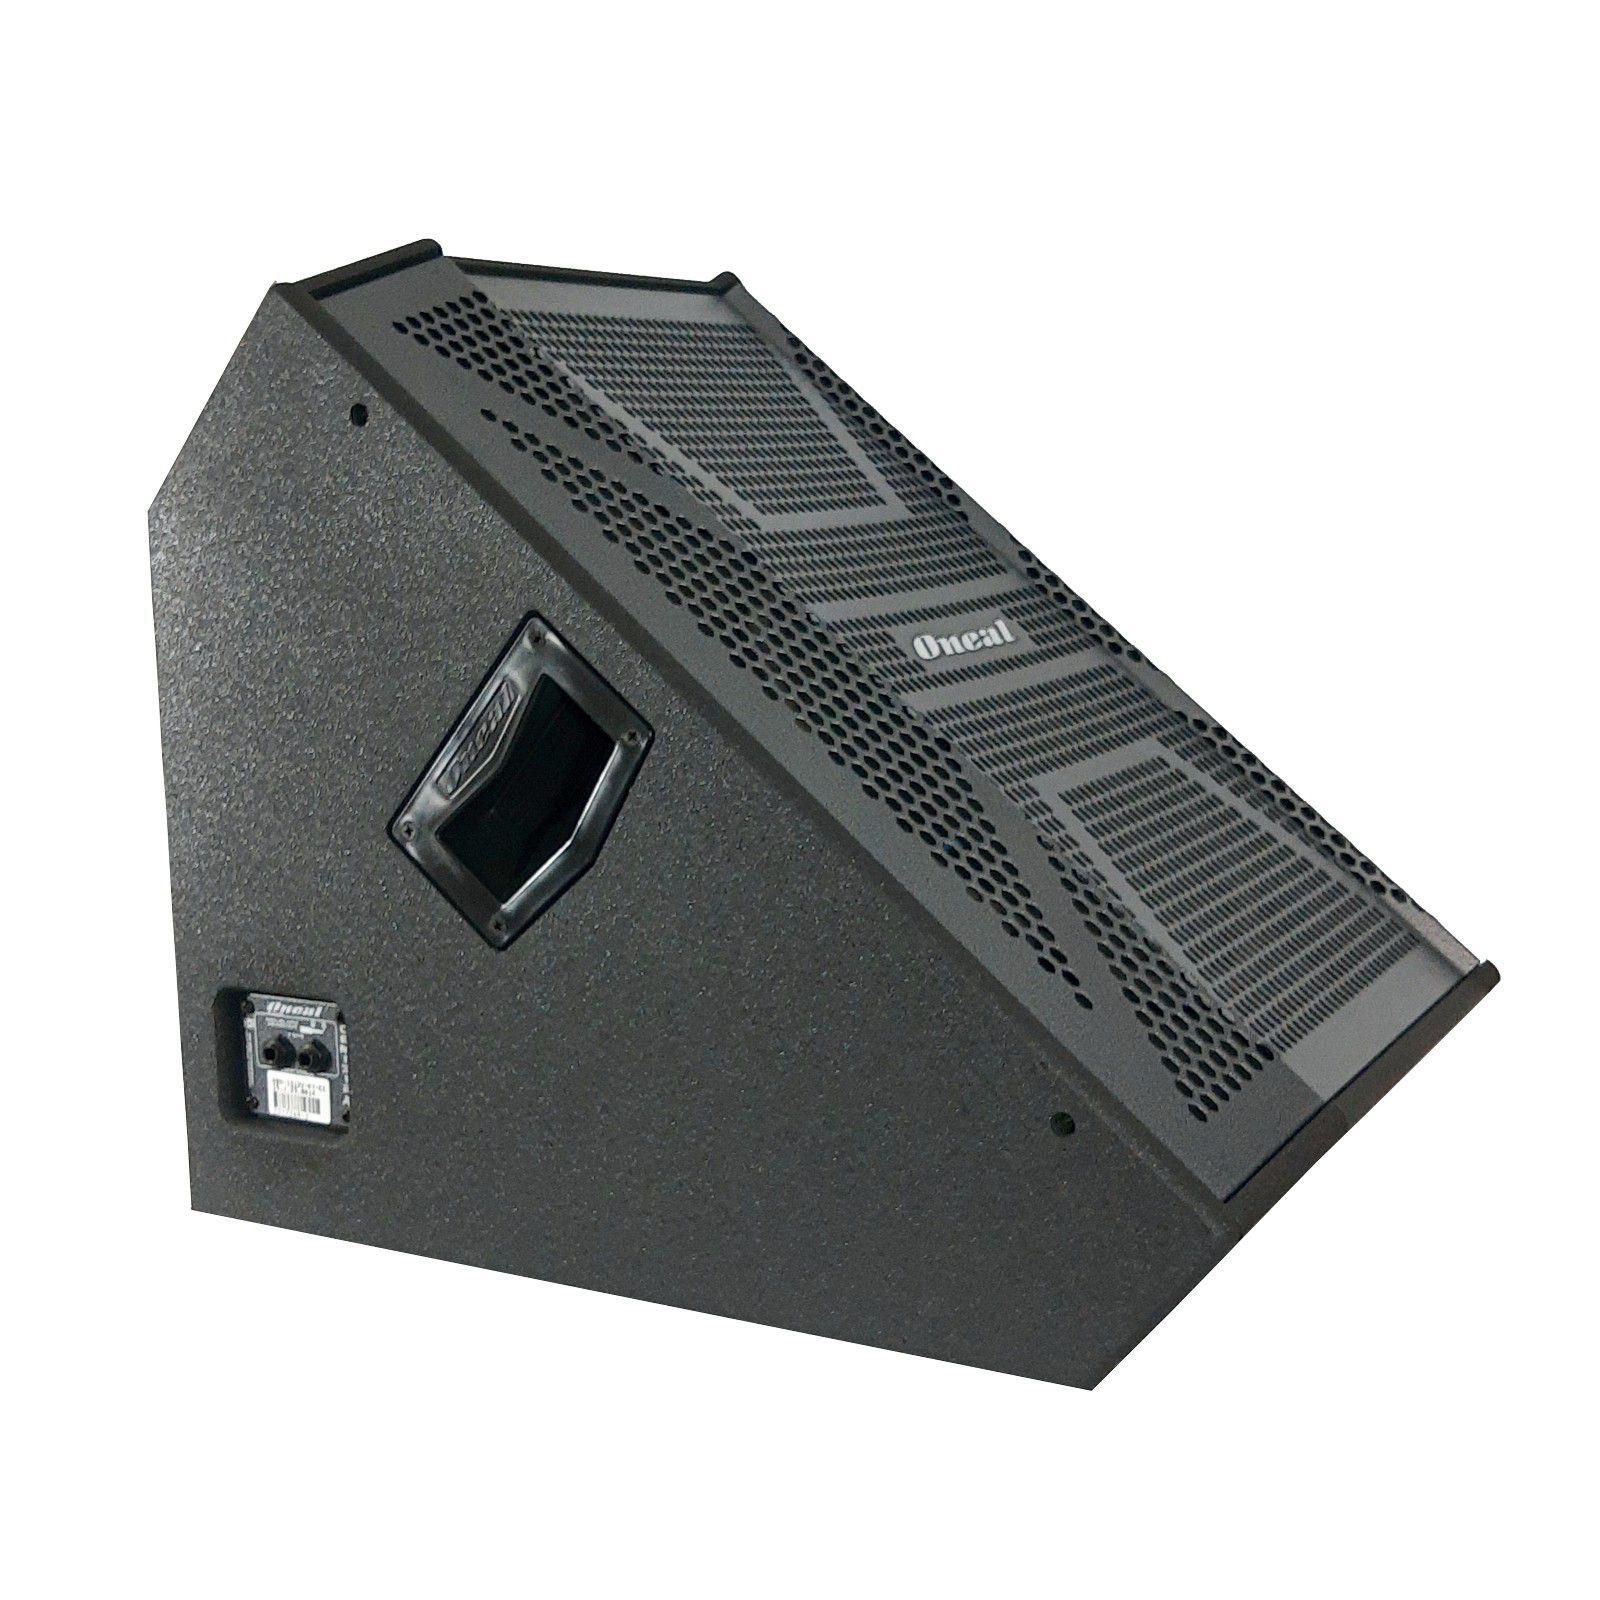 Kit Monitor Palco Ativo Passivo Oneal Opm1312x Obm1312x 200w Rms